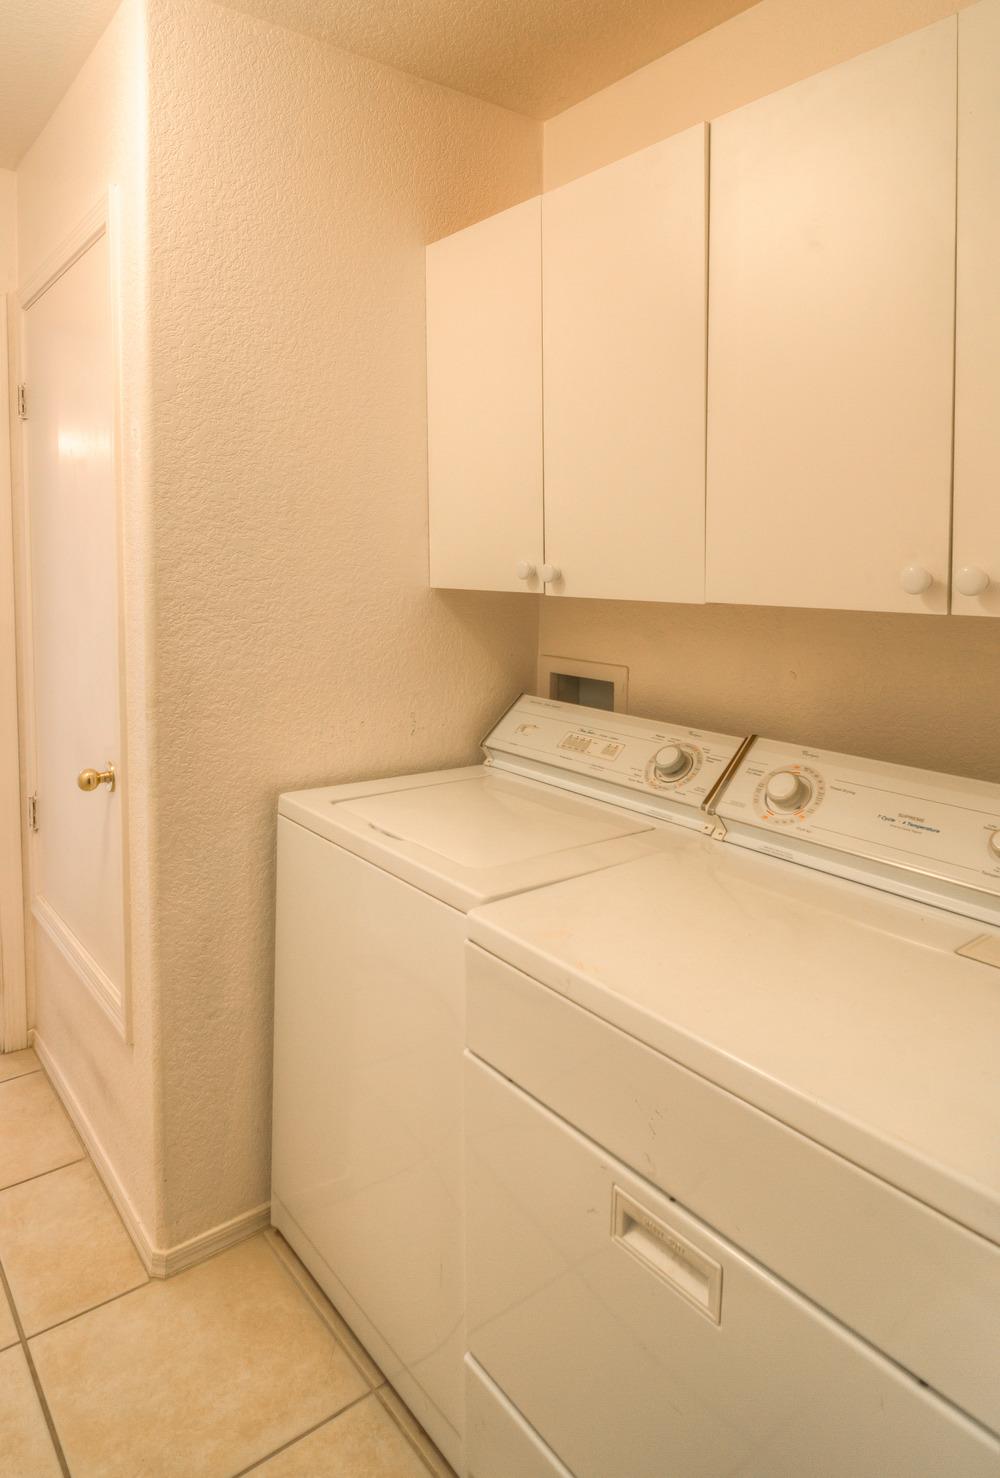 40 Laundry Room photo b.jpg